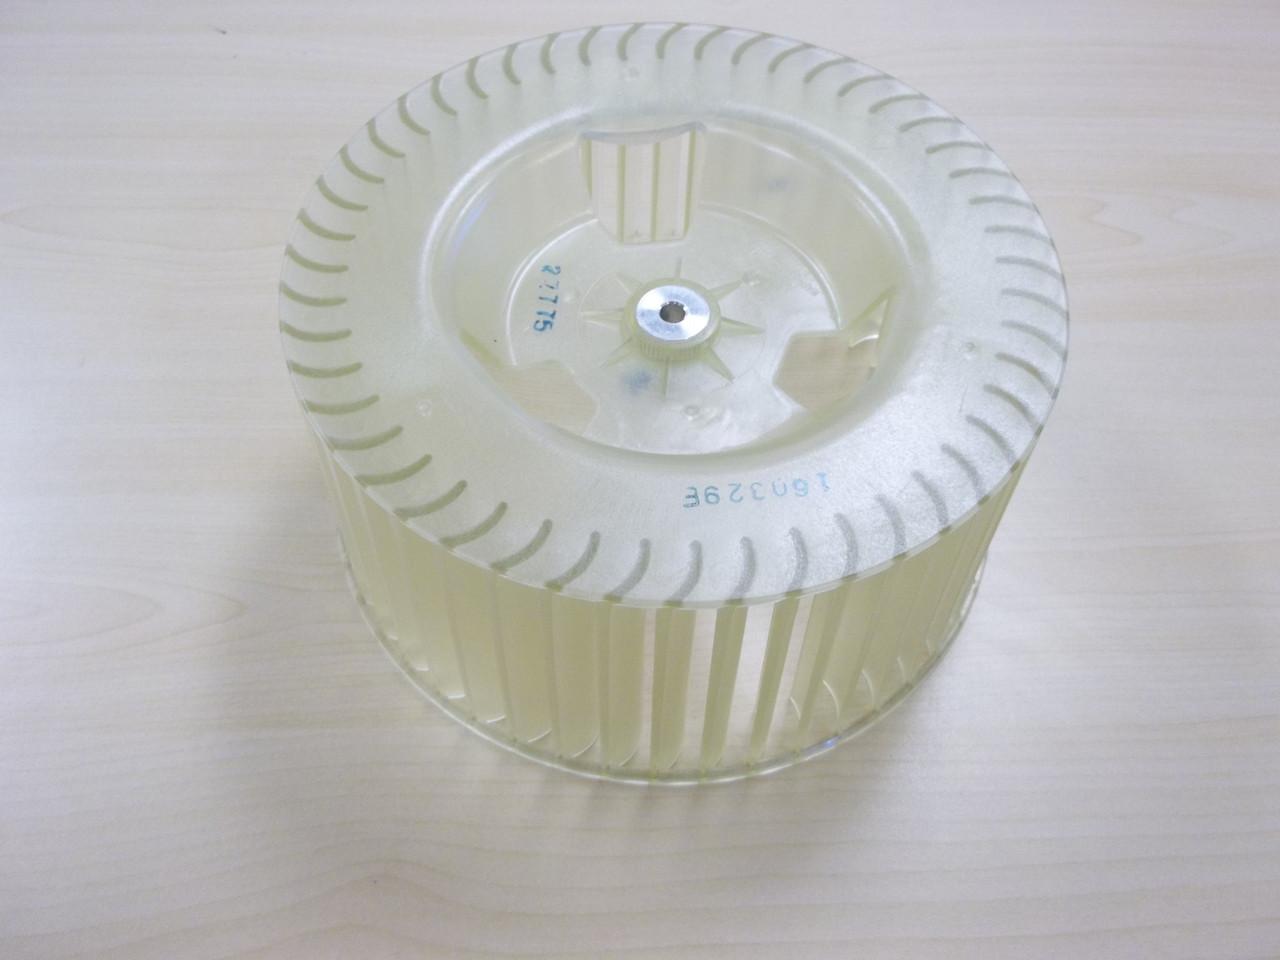 blower wheel exhaust fan lower fan yellow colored for arc 12sd arc 14s arc 14sh arc 141bg arc 143mx